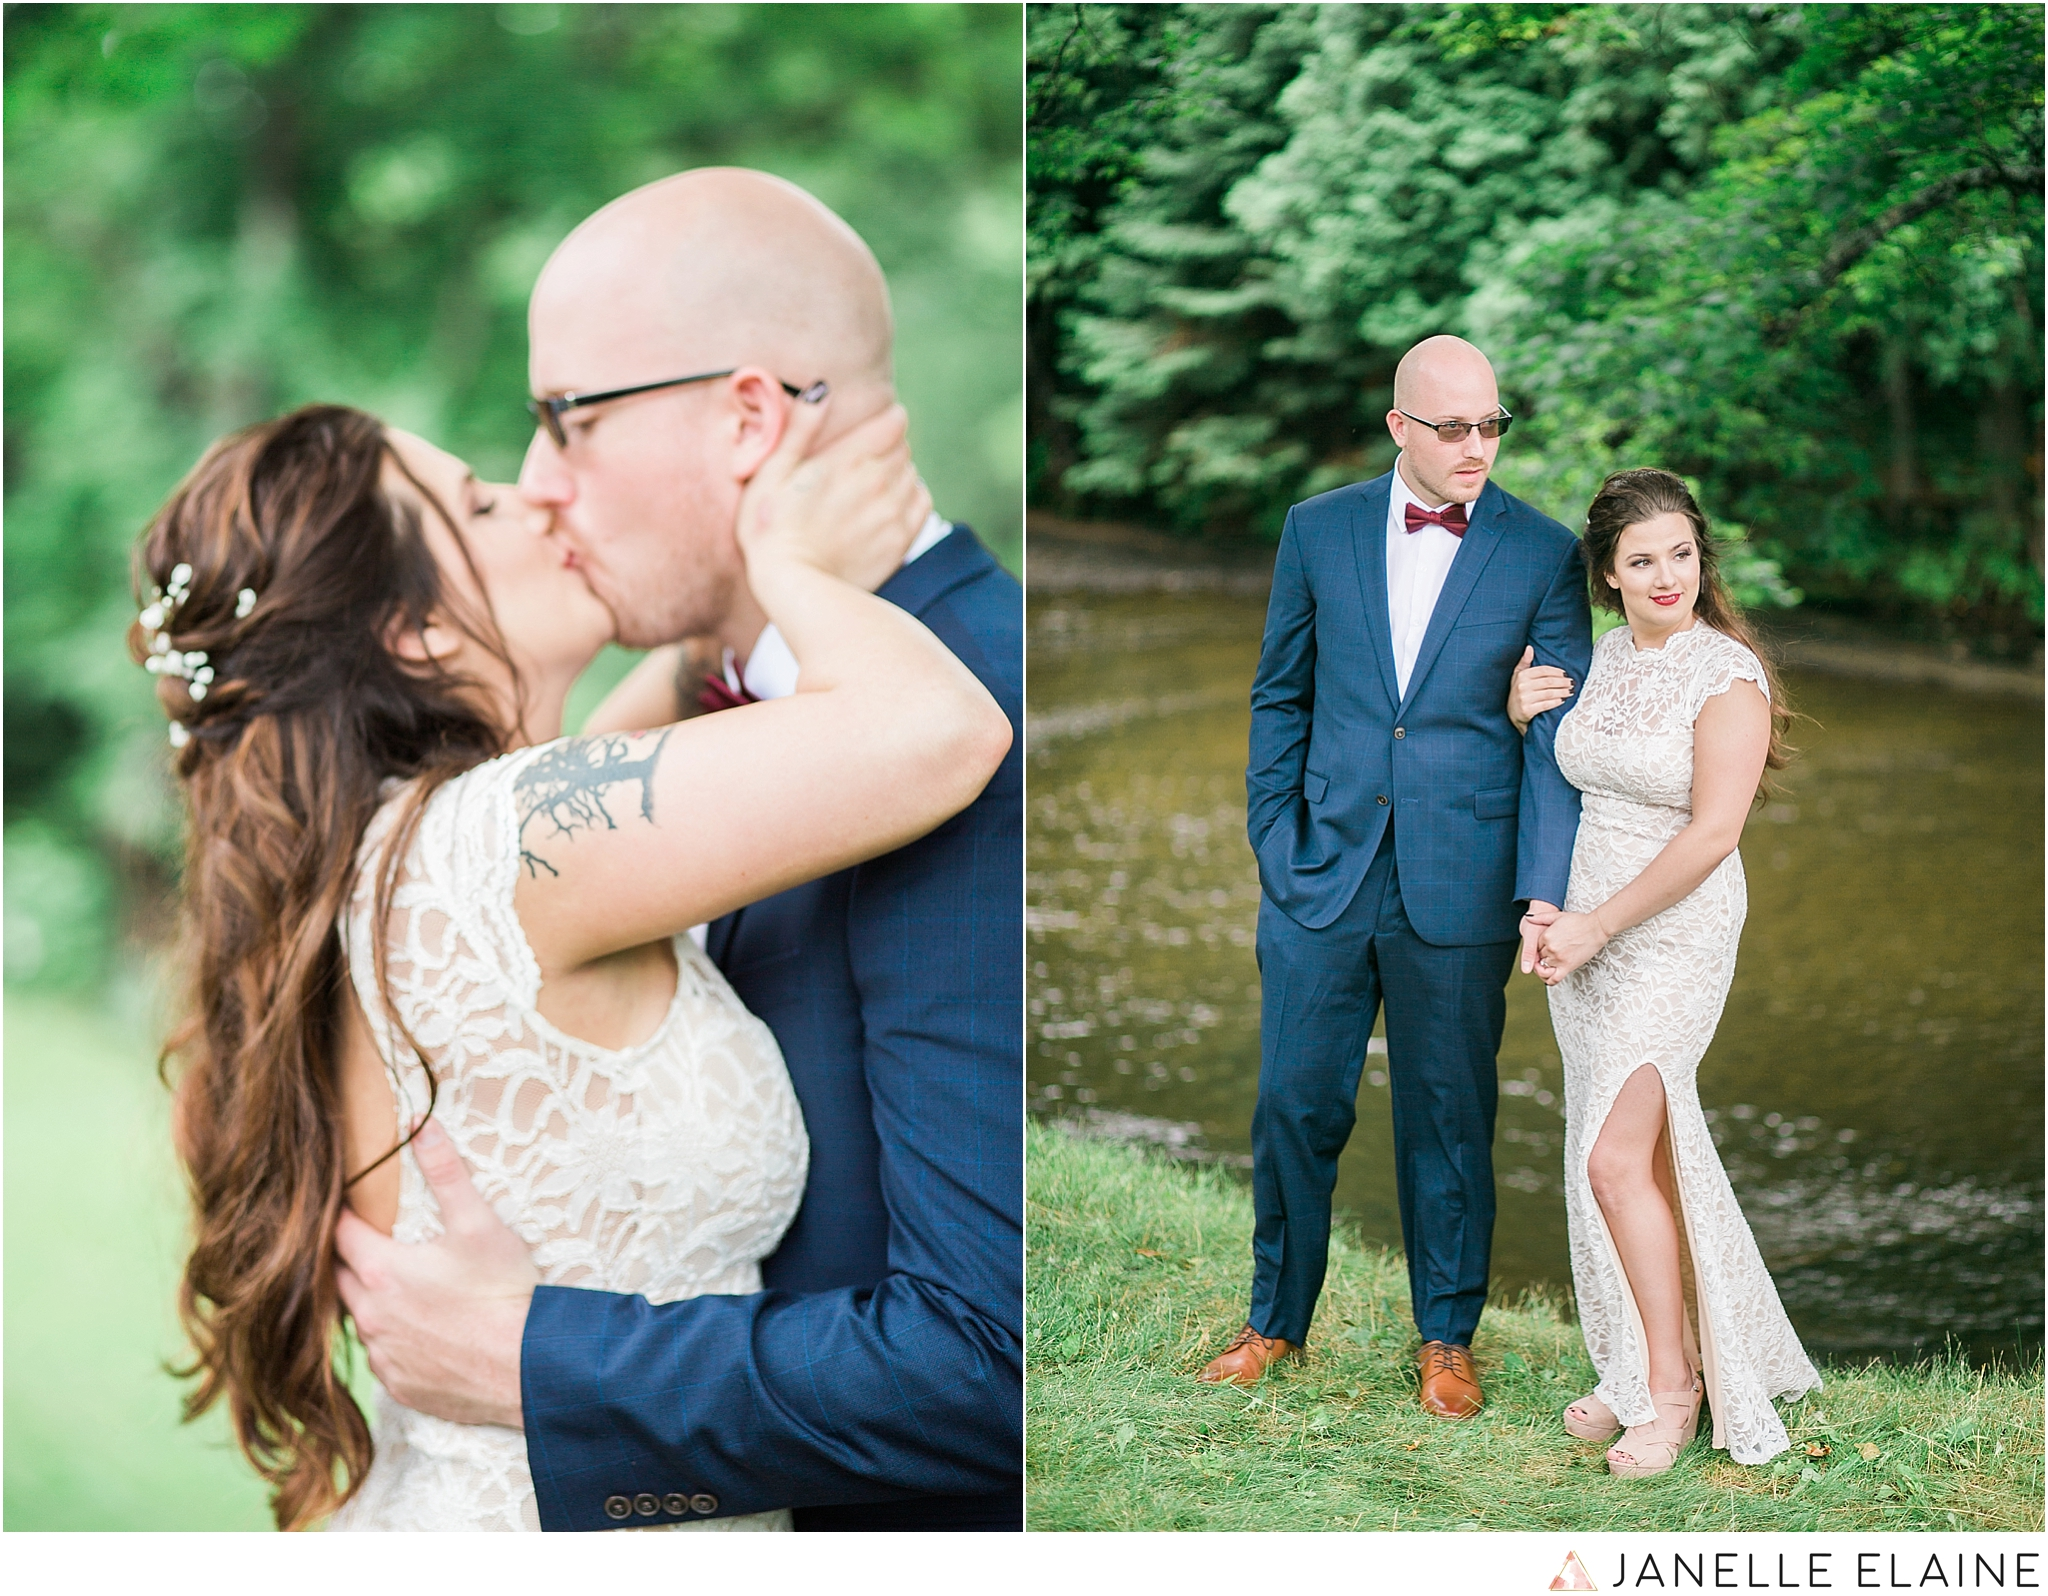 janelle elaine photography-seattle-destination-wedding-photographer-24.jpg